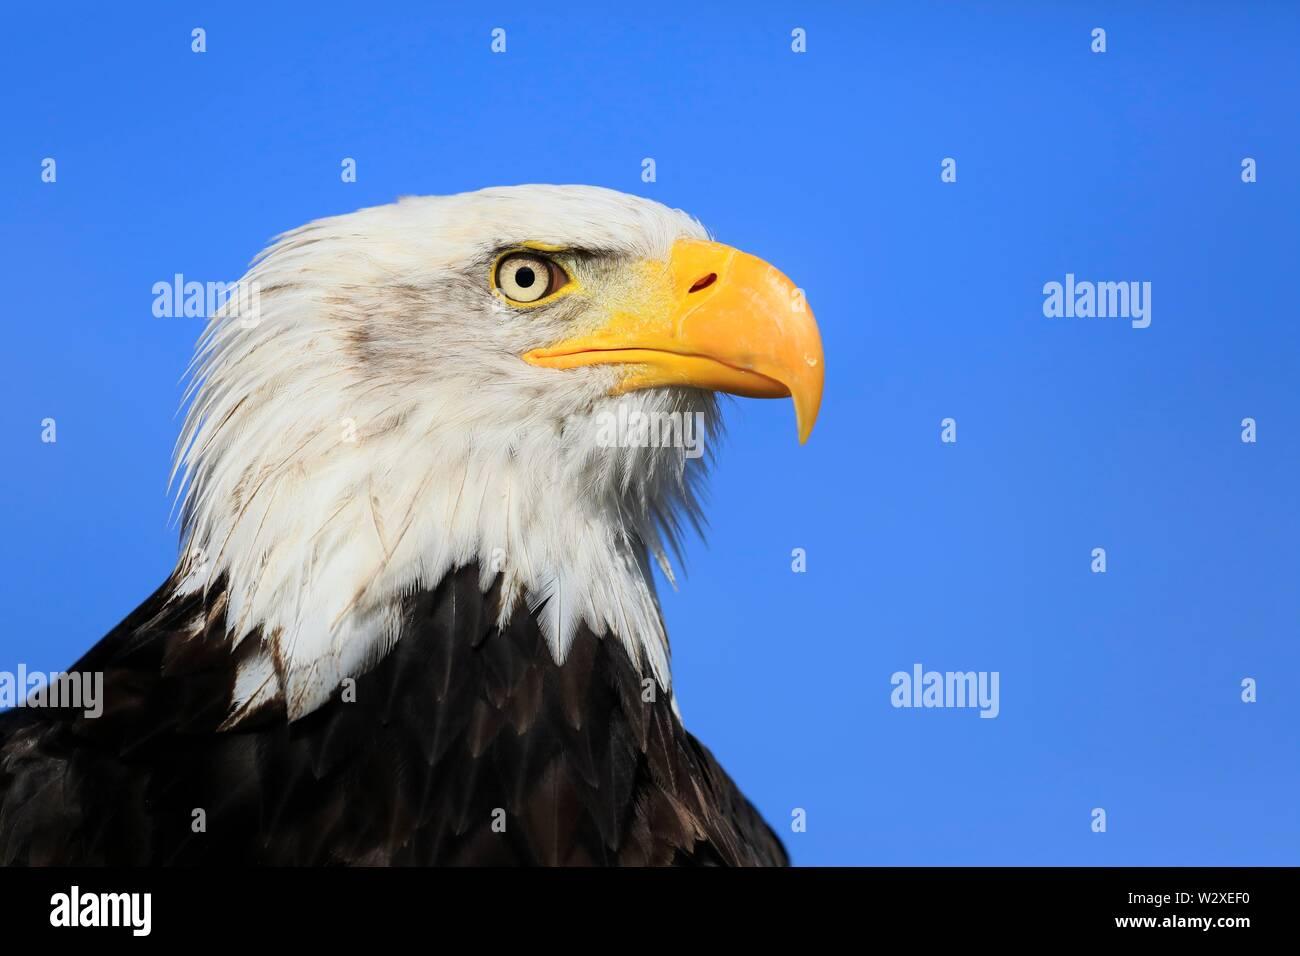 Bald eagle (Haliaeetus leucocephalus), adult, animal portrait, captive, Slovakia - Stock Image